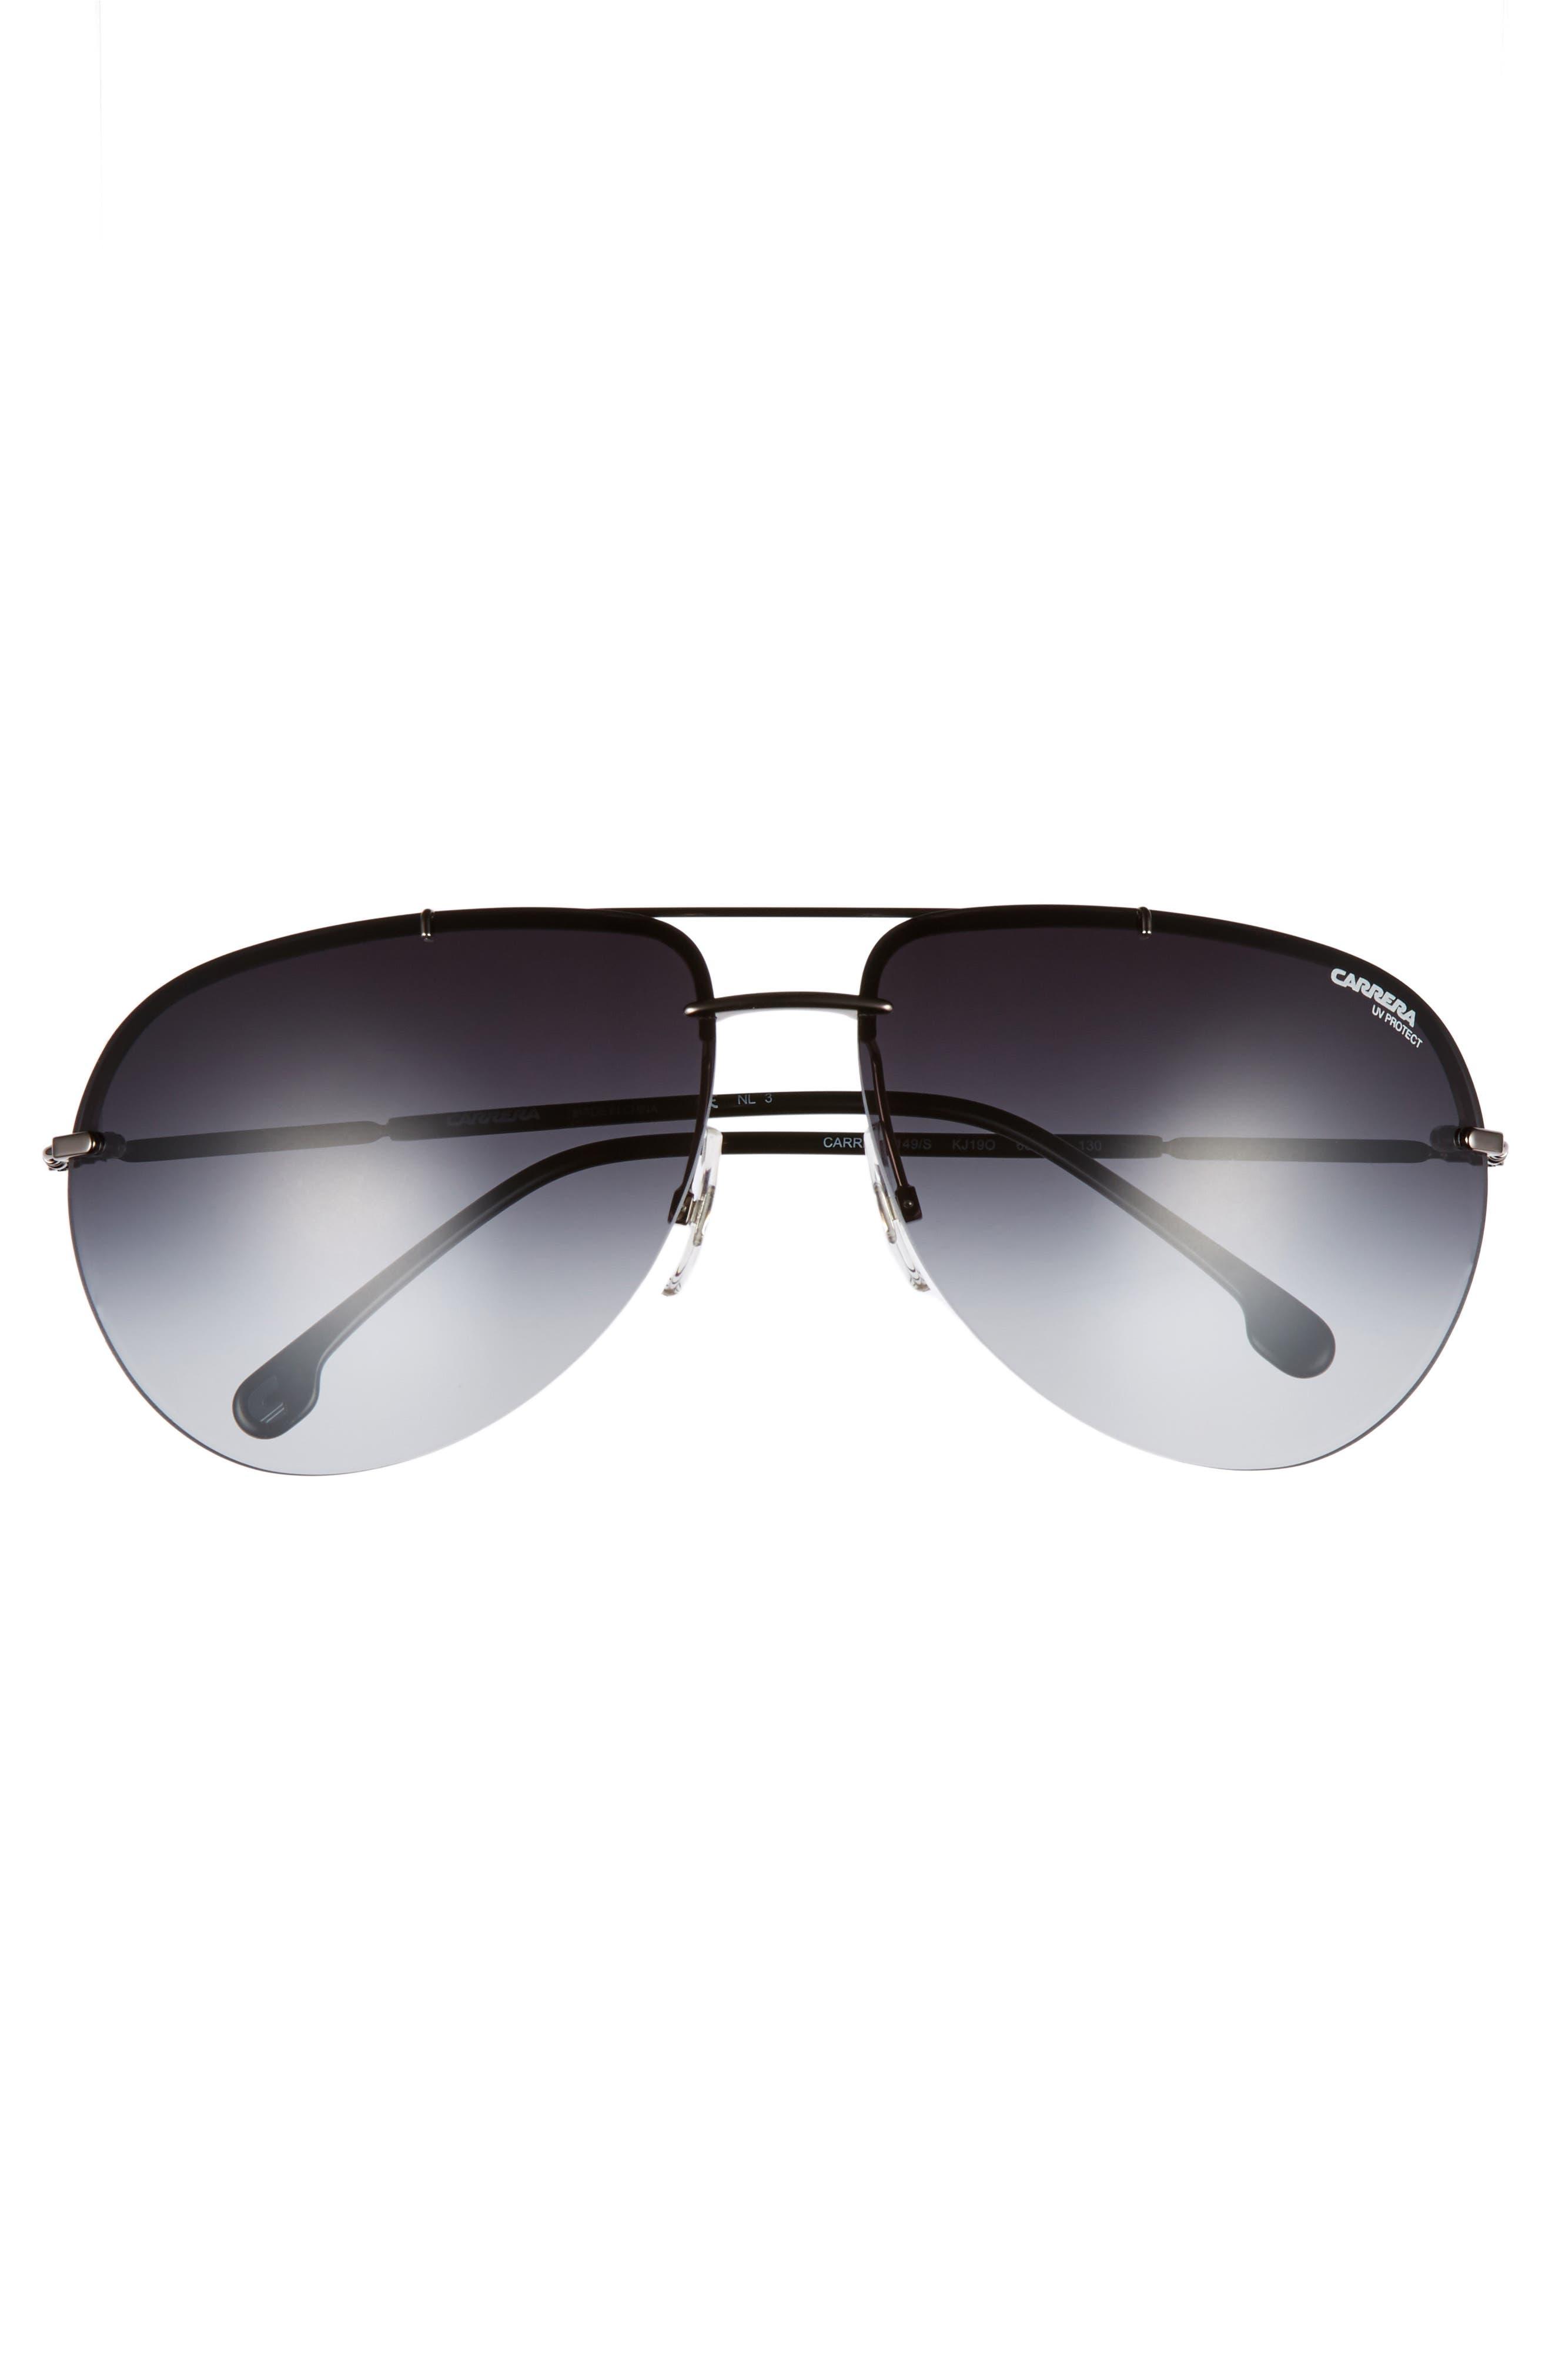 149S 65mm Polarized Aviator Sunglasses,                             Alternate thumbnail 2, color,                             DARK RUTHENIUM / GRAY GRADIENT